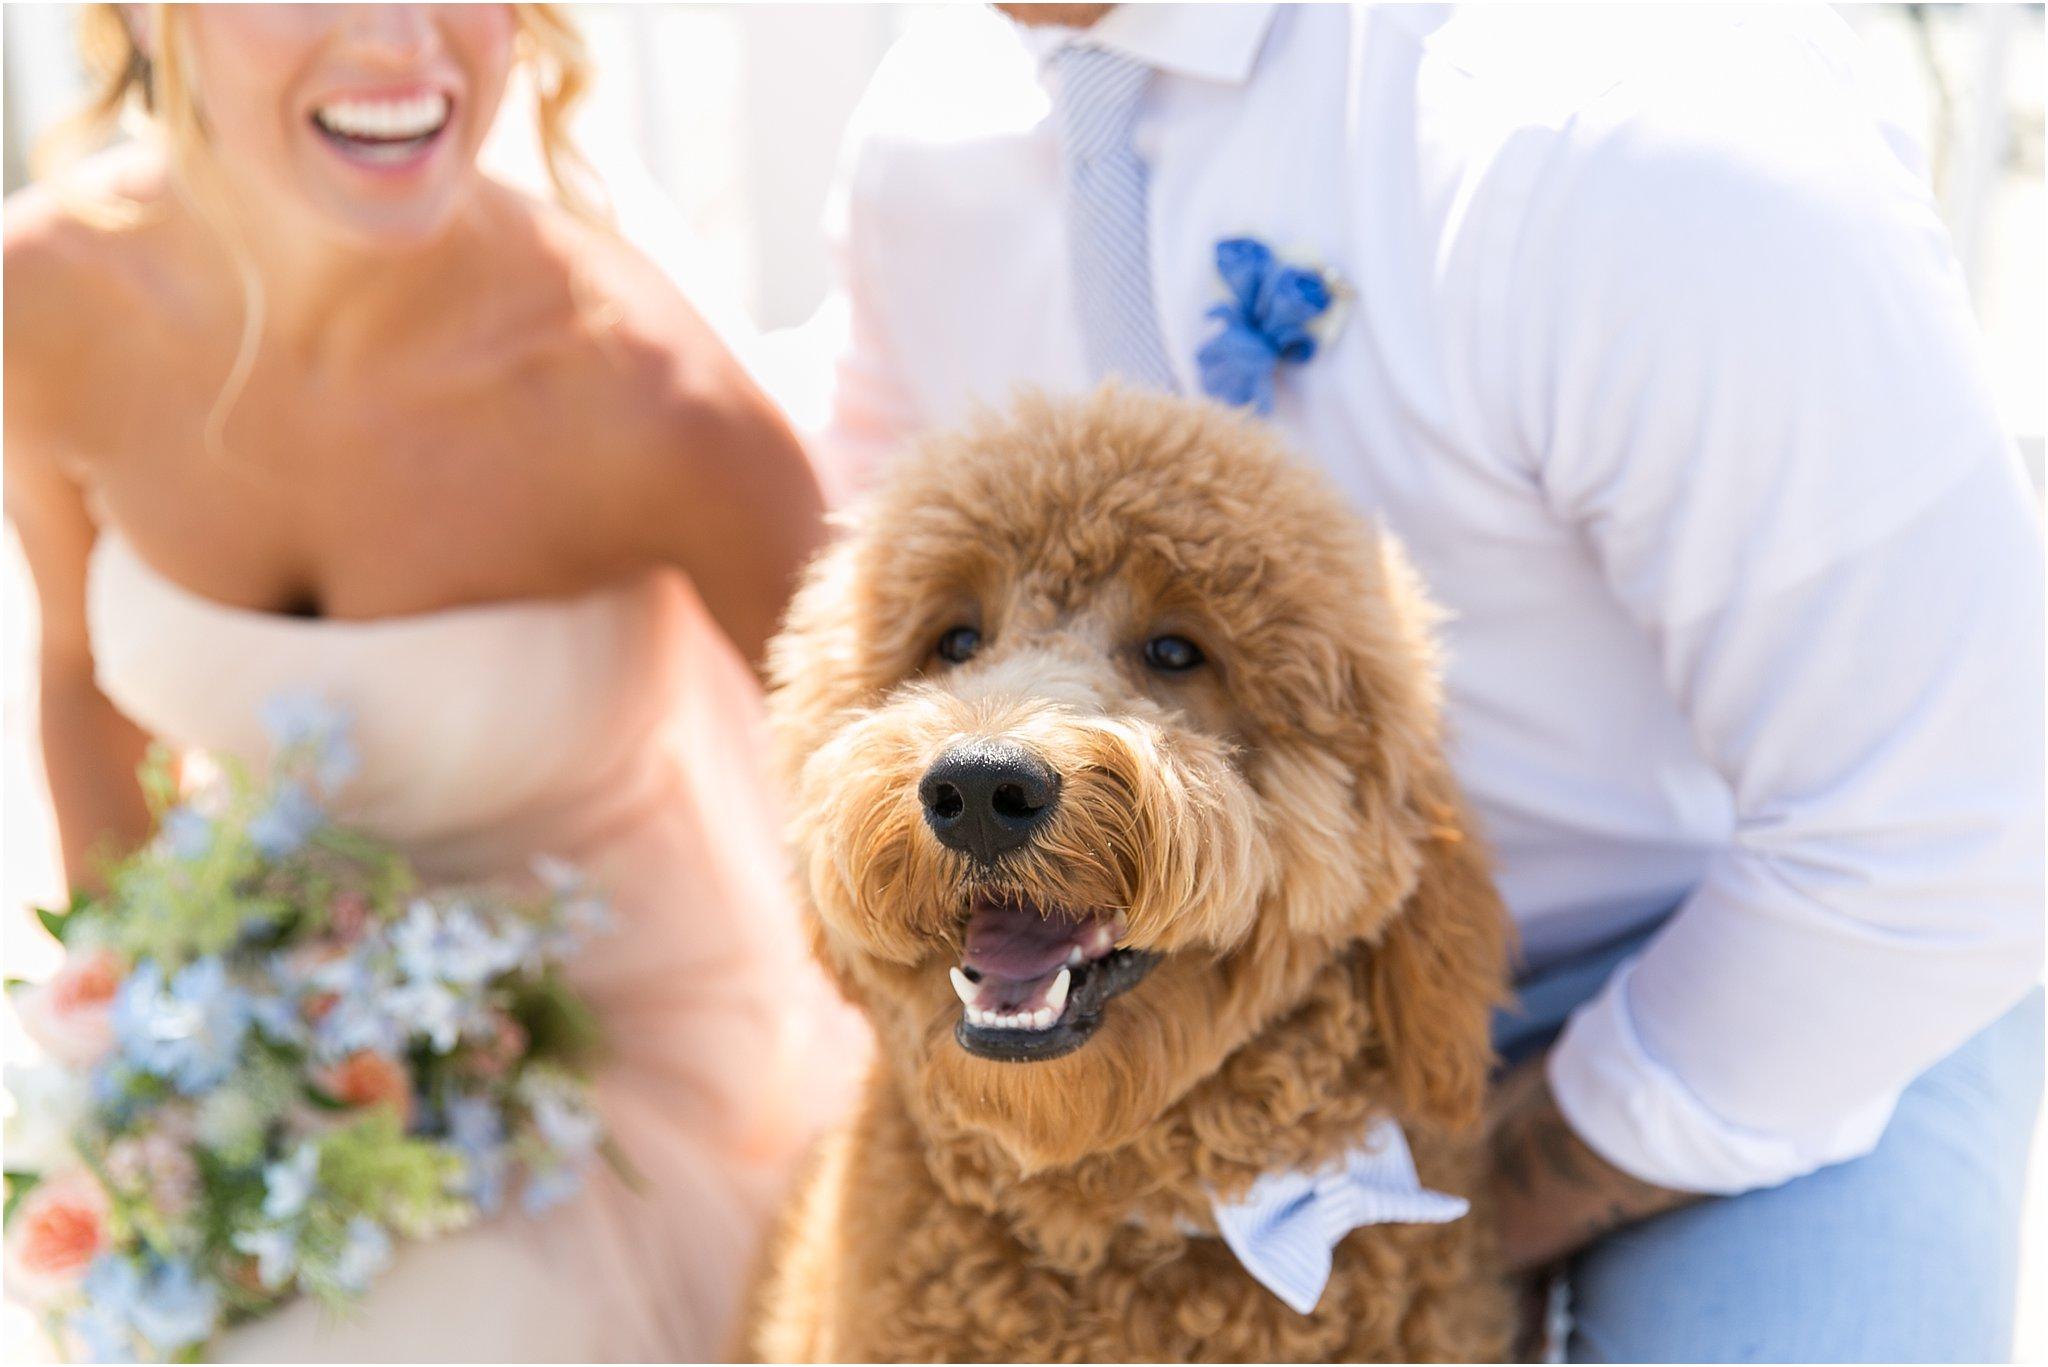 jessica_ryan_photography_virginia_beach_water_tabe_wedding_vera_wang_wedding_dress_0619